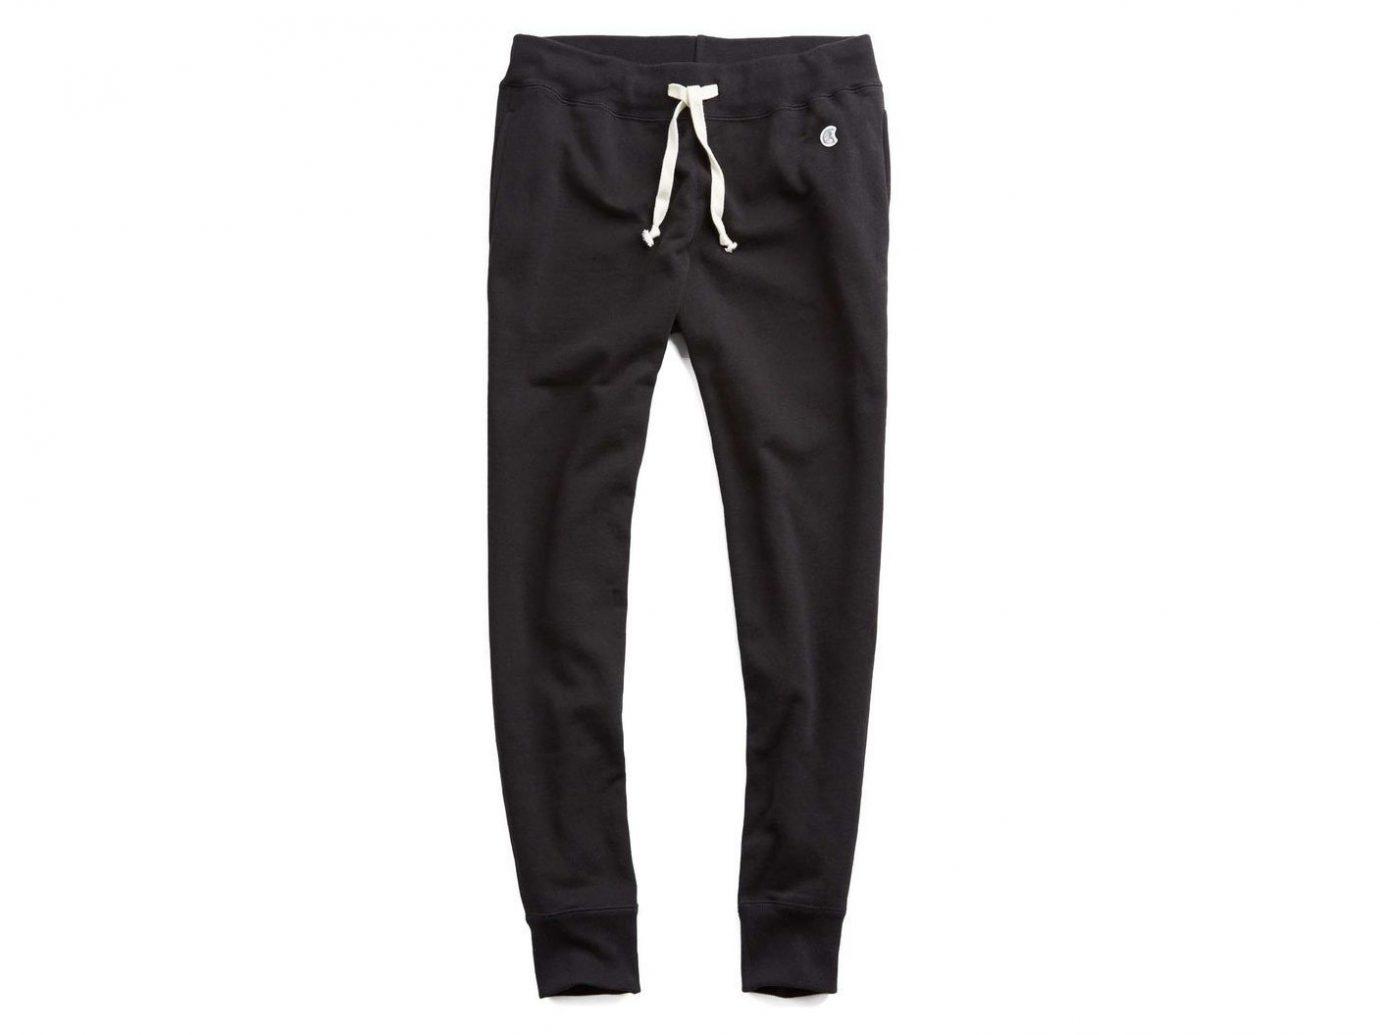 Style + Design Travel Shop active pants trousers pocket product jeans waist formal wear